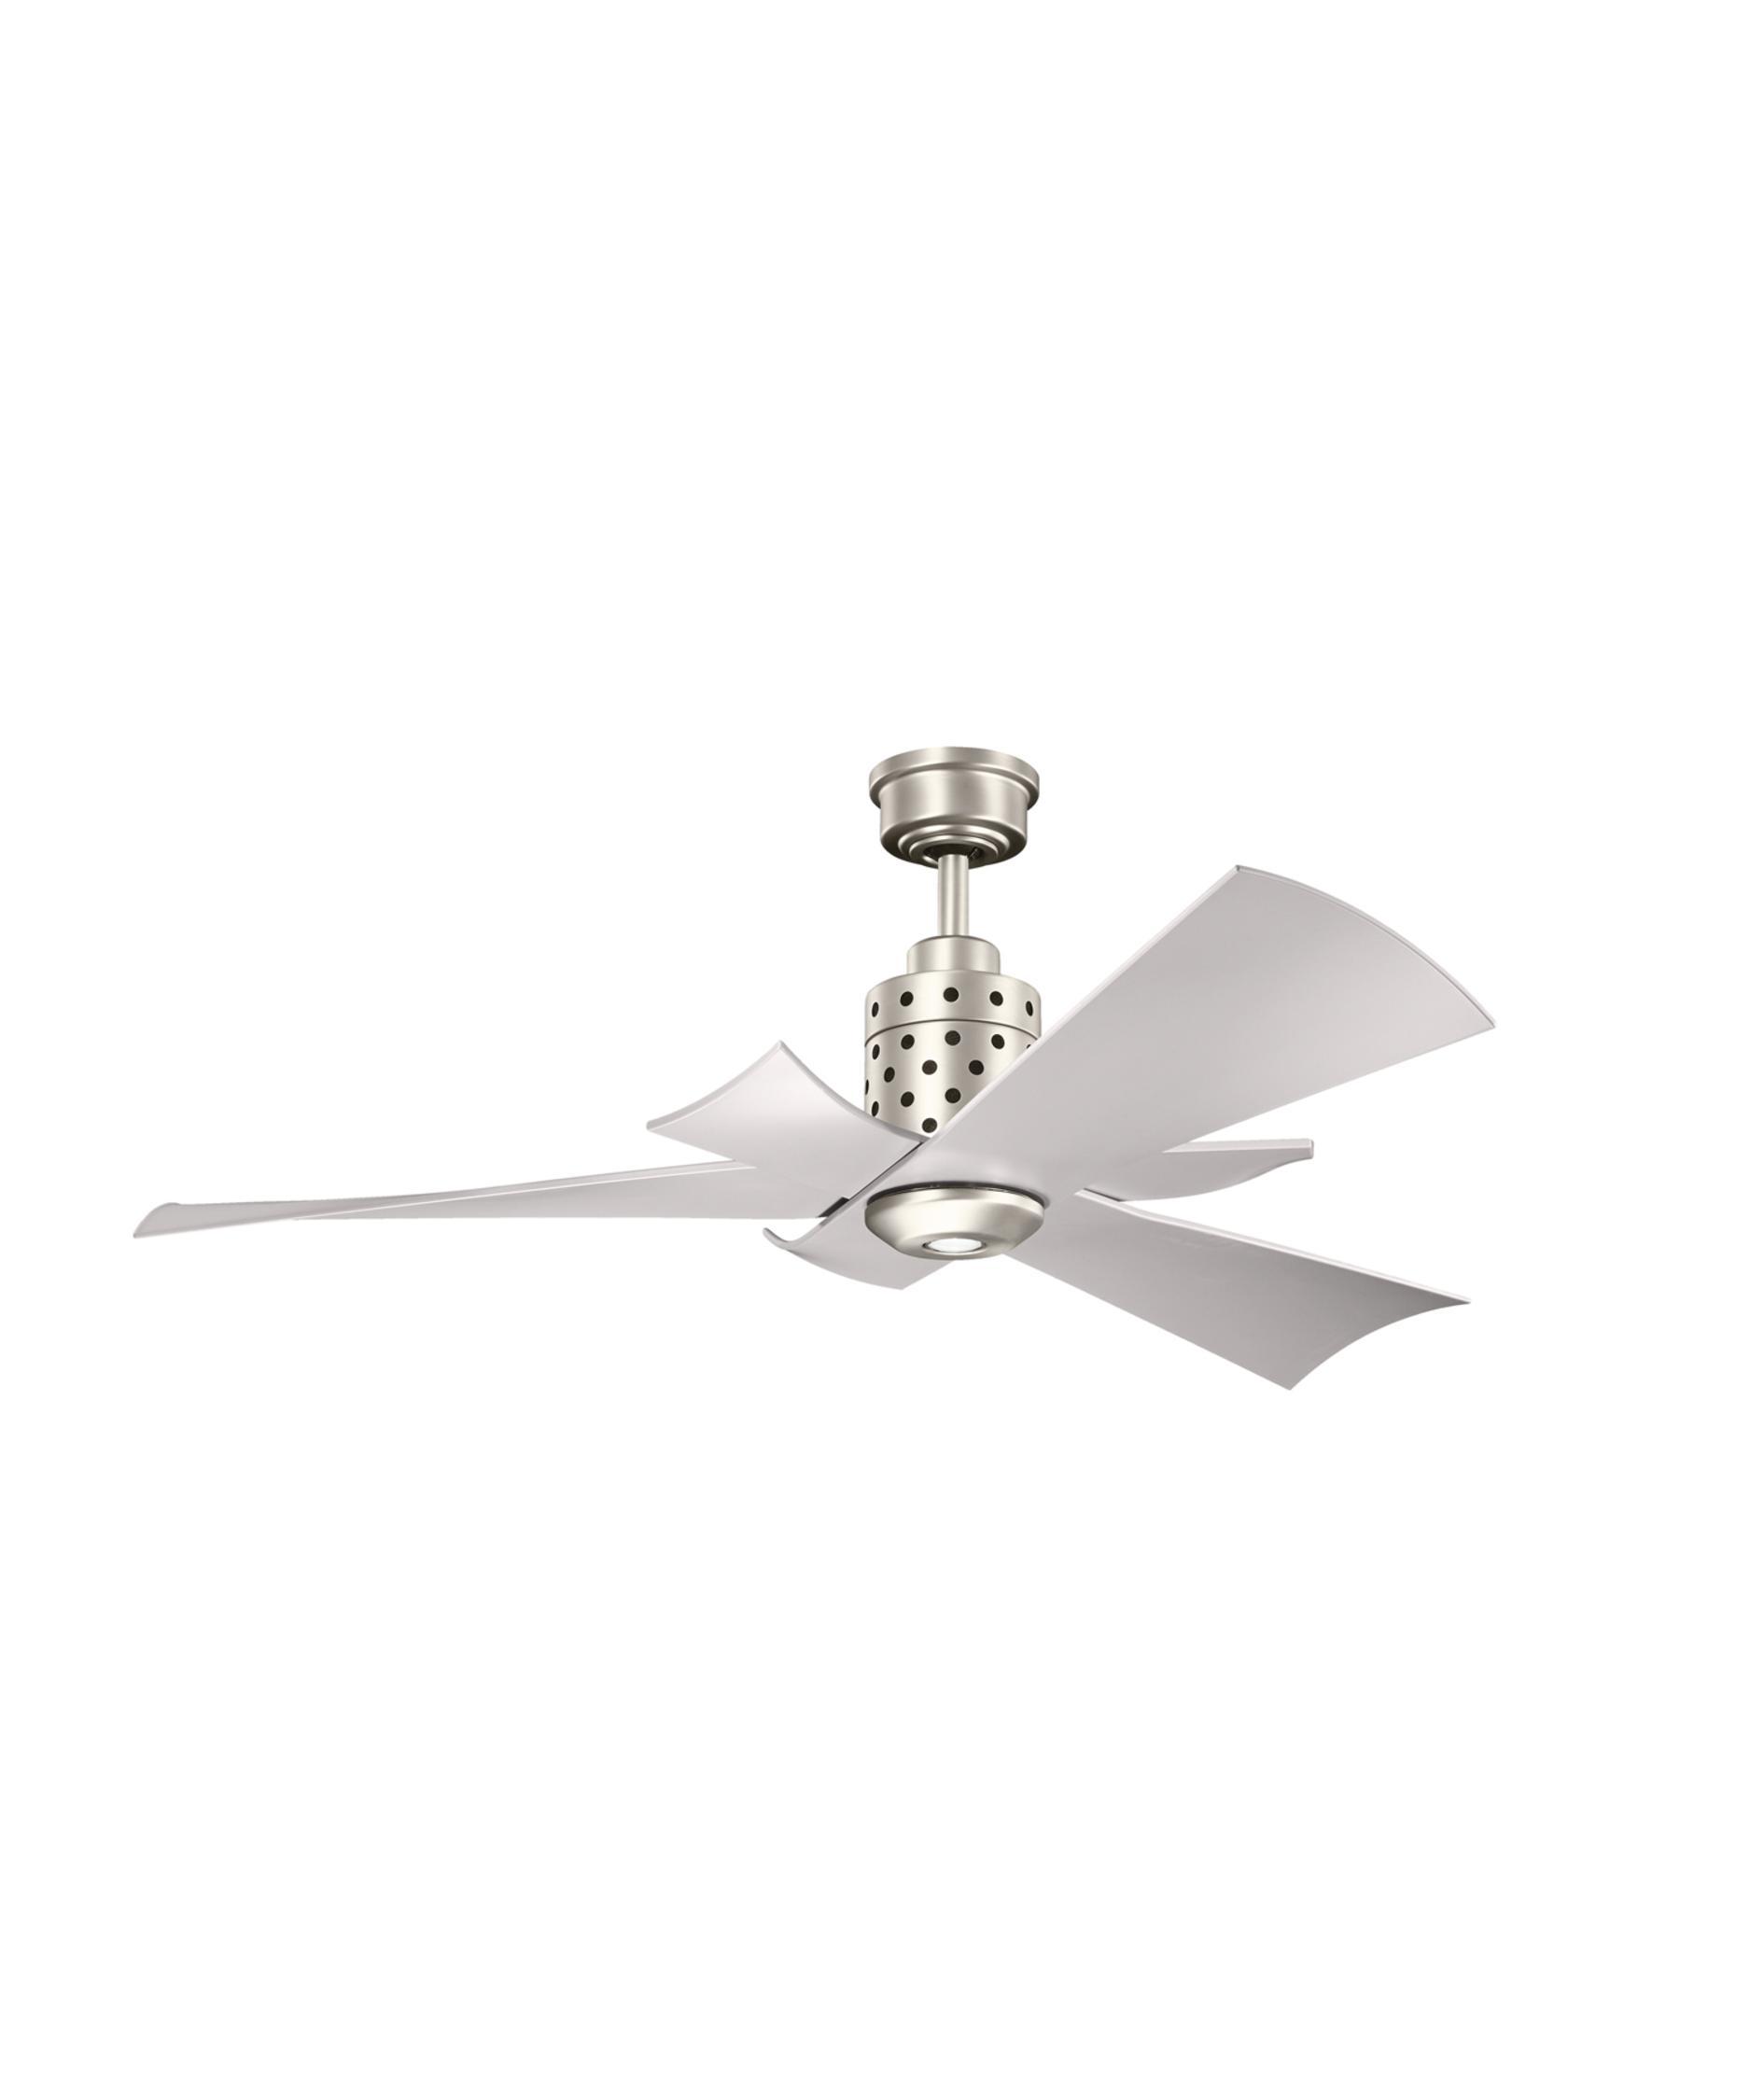 Kichler 300163 Frey 56 Inch Ceiling Fan With Light Kit